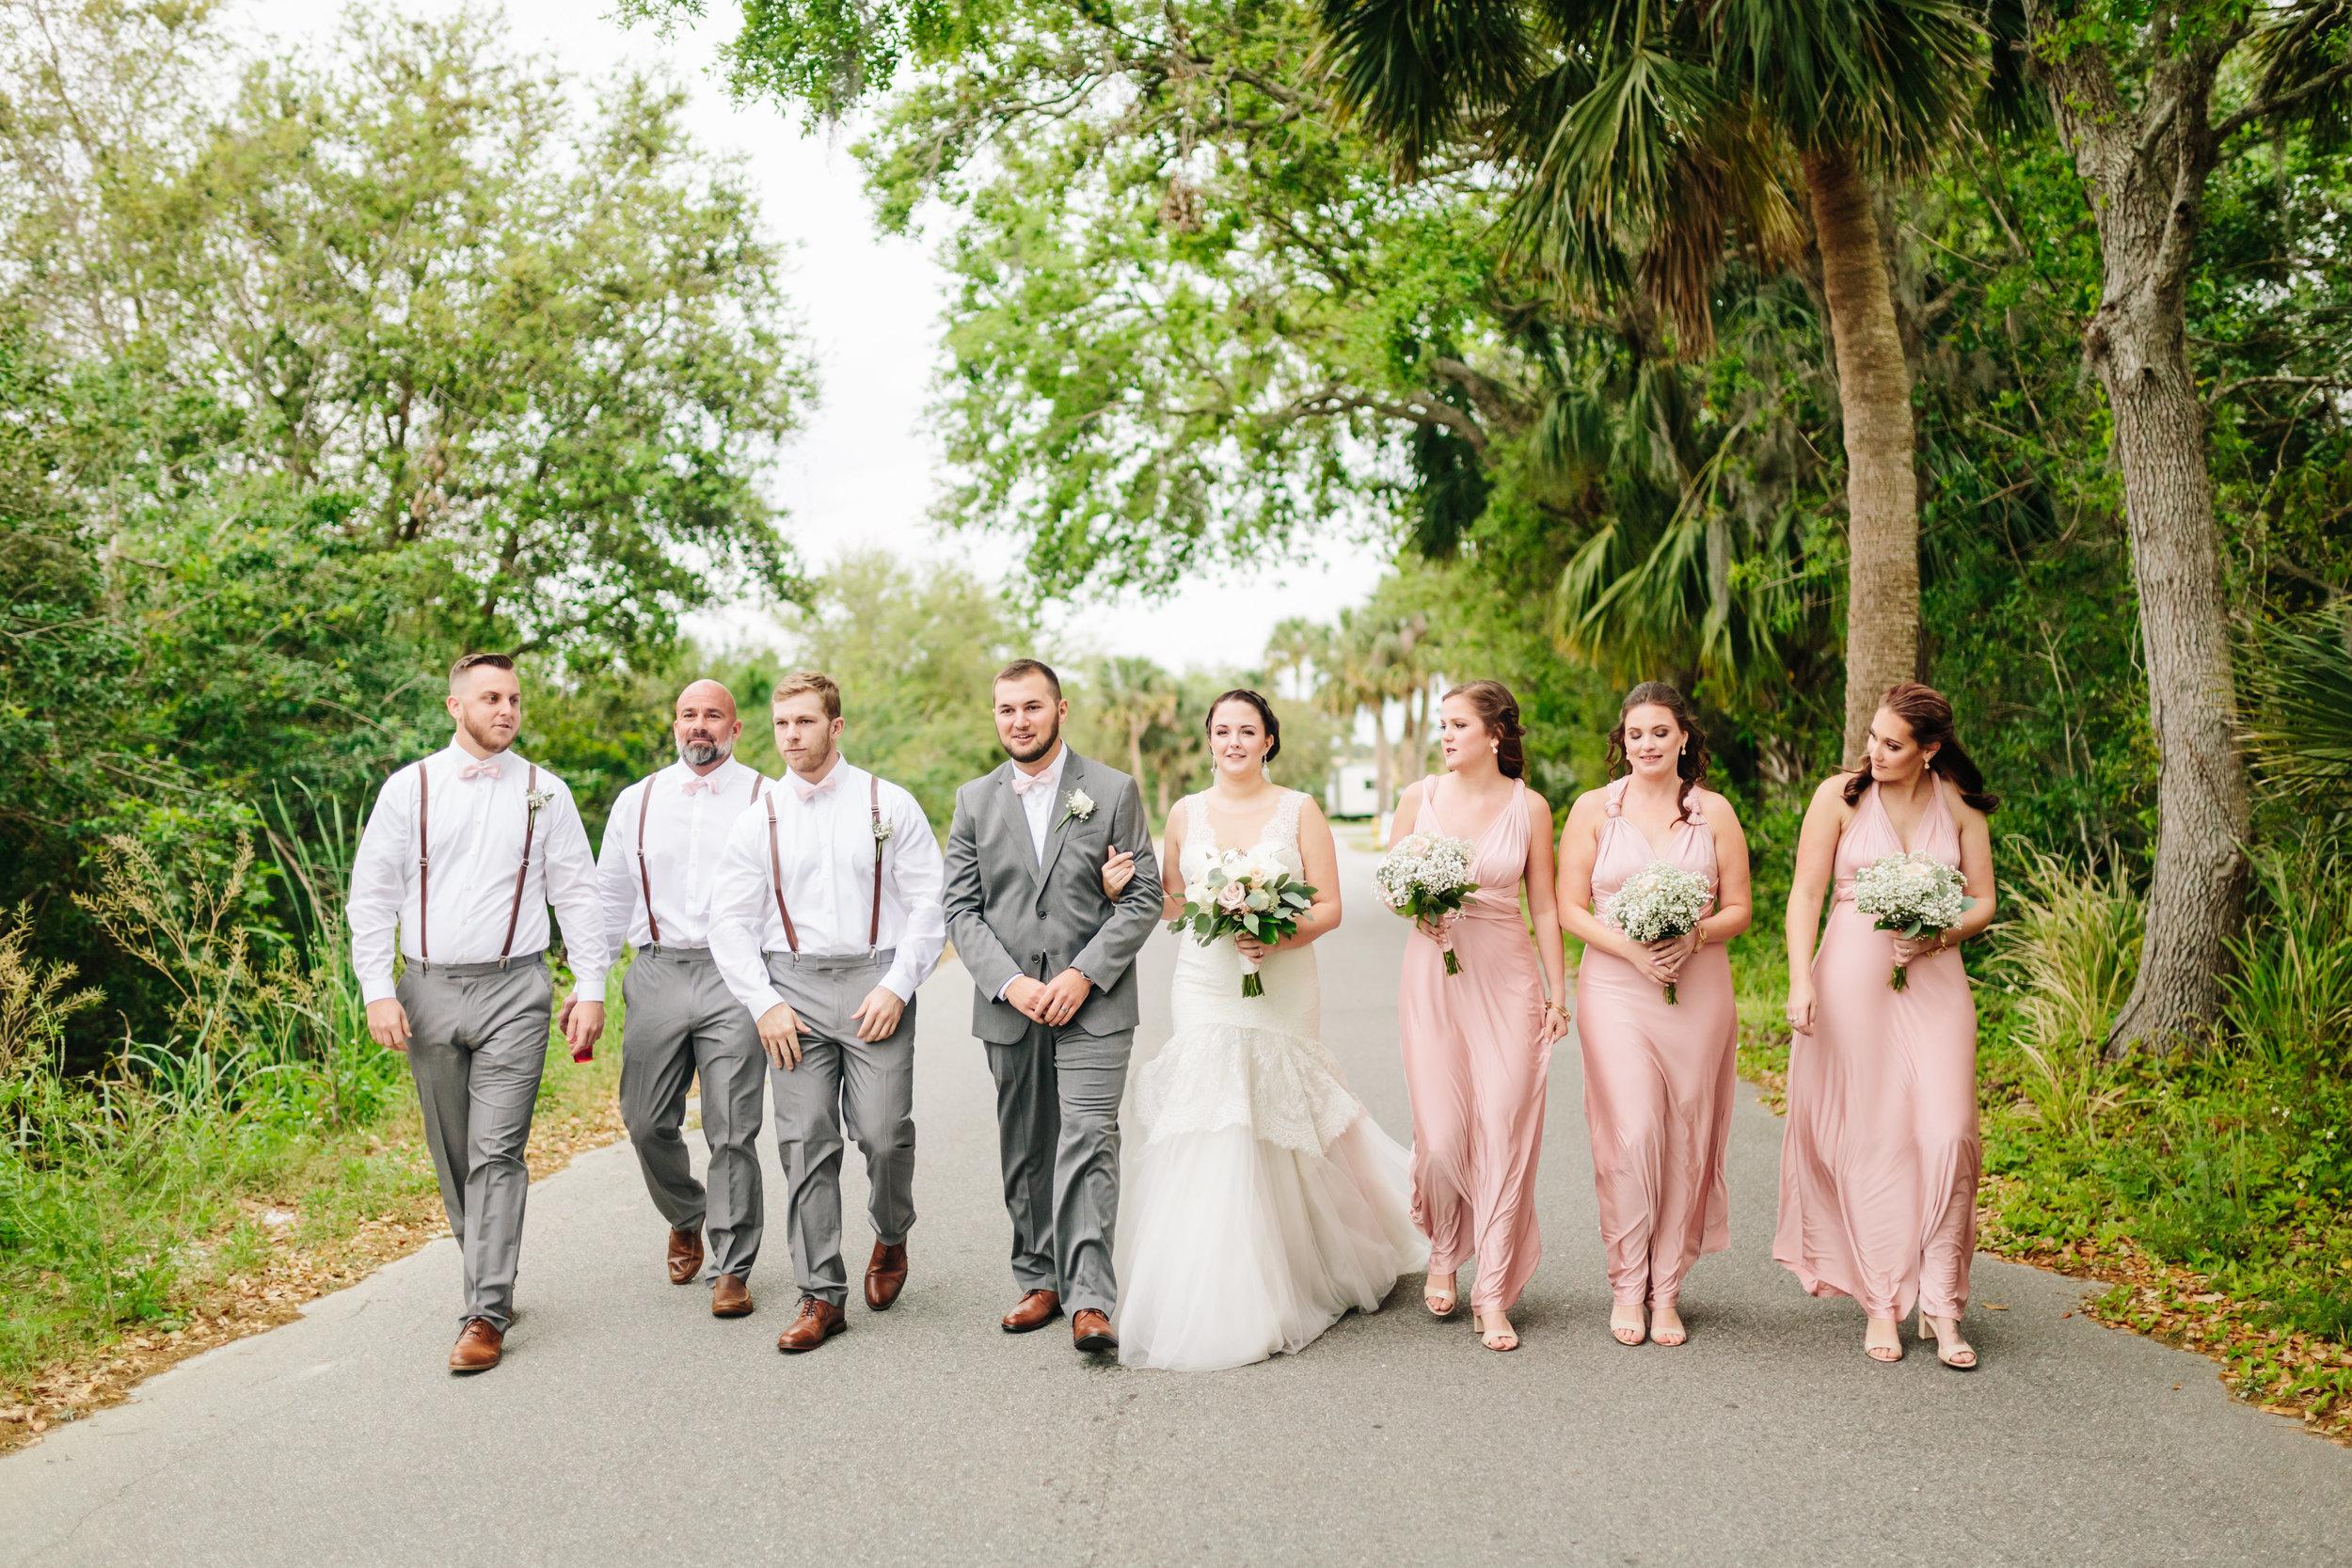 Kaleb and Cole Swancott Birdsong Barn Wedding (354 of 545).jpg